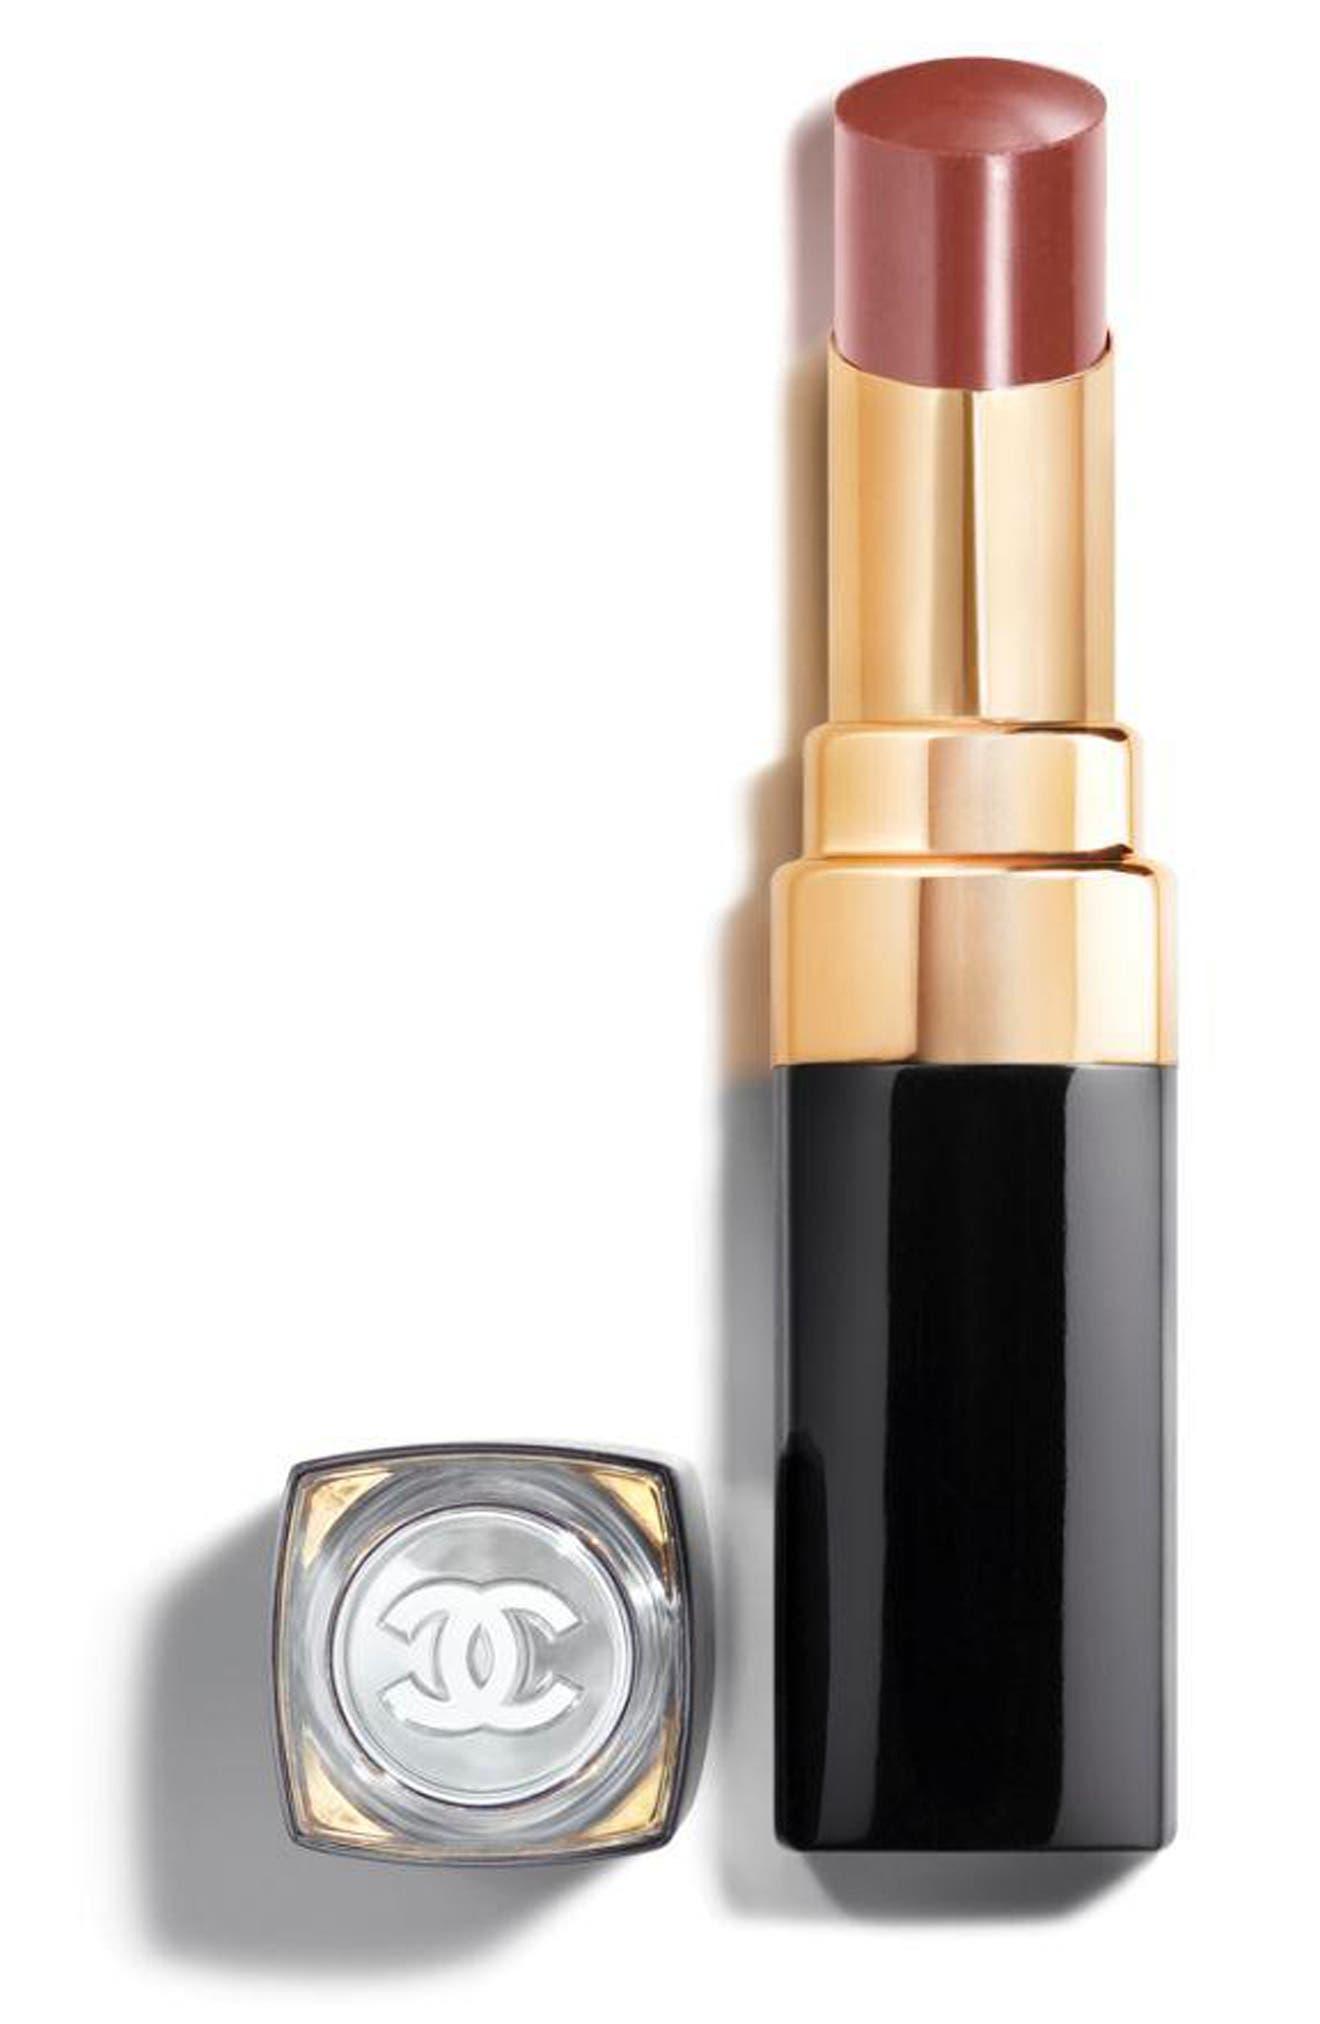 ROUGE COCO FLASH <br />Lipstick, Main, color, 56 MOMENT